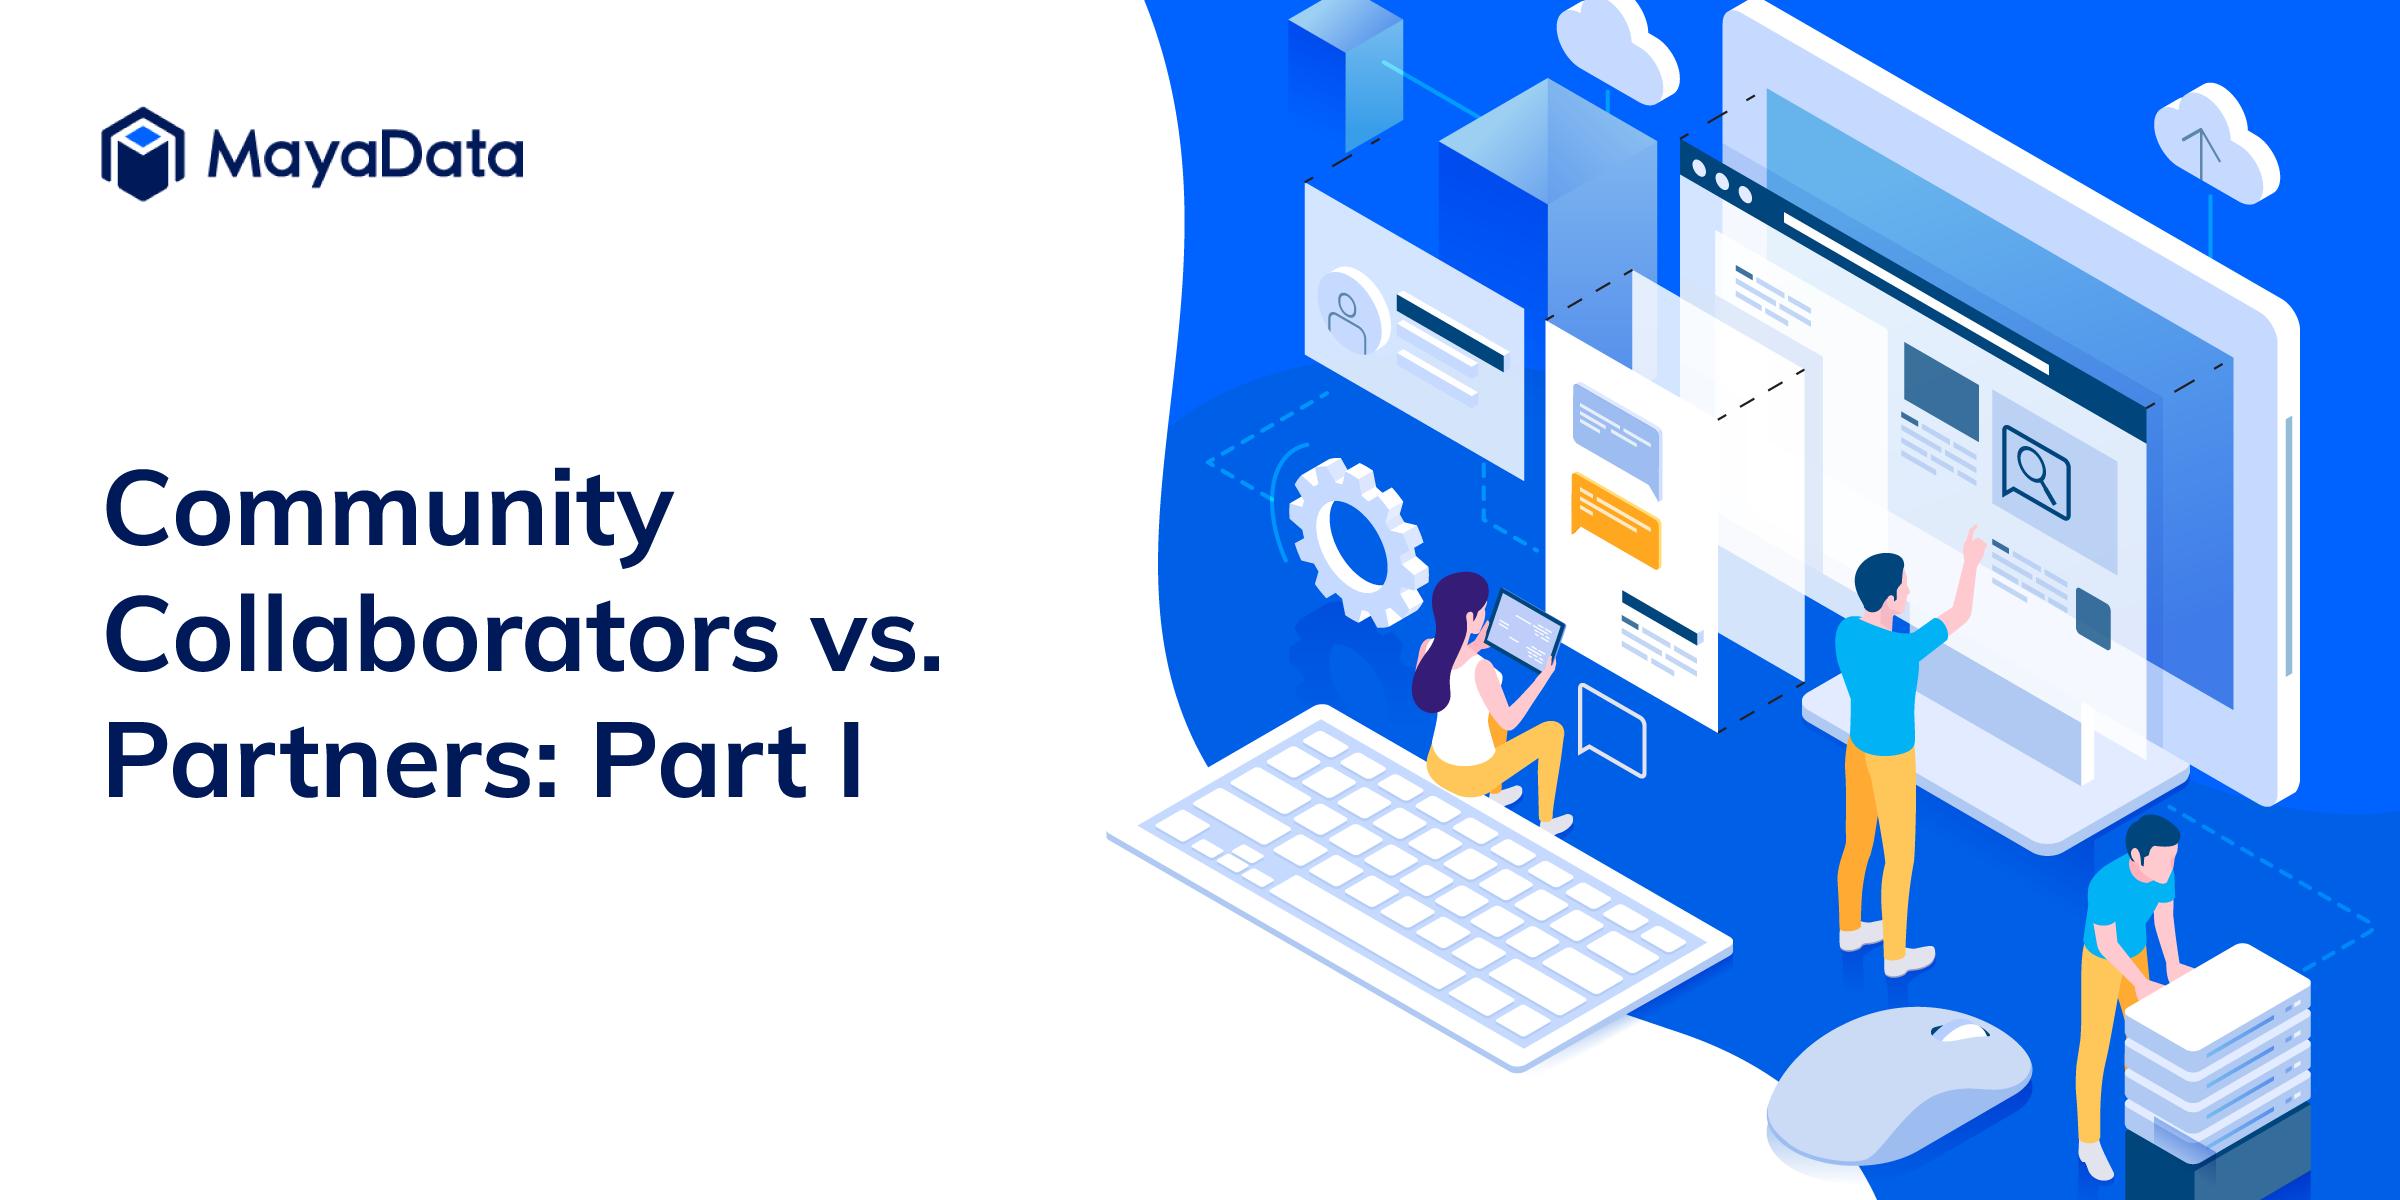 Community collaborators vs Partners: Part 1